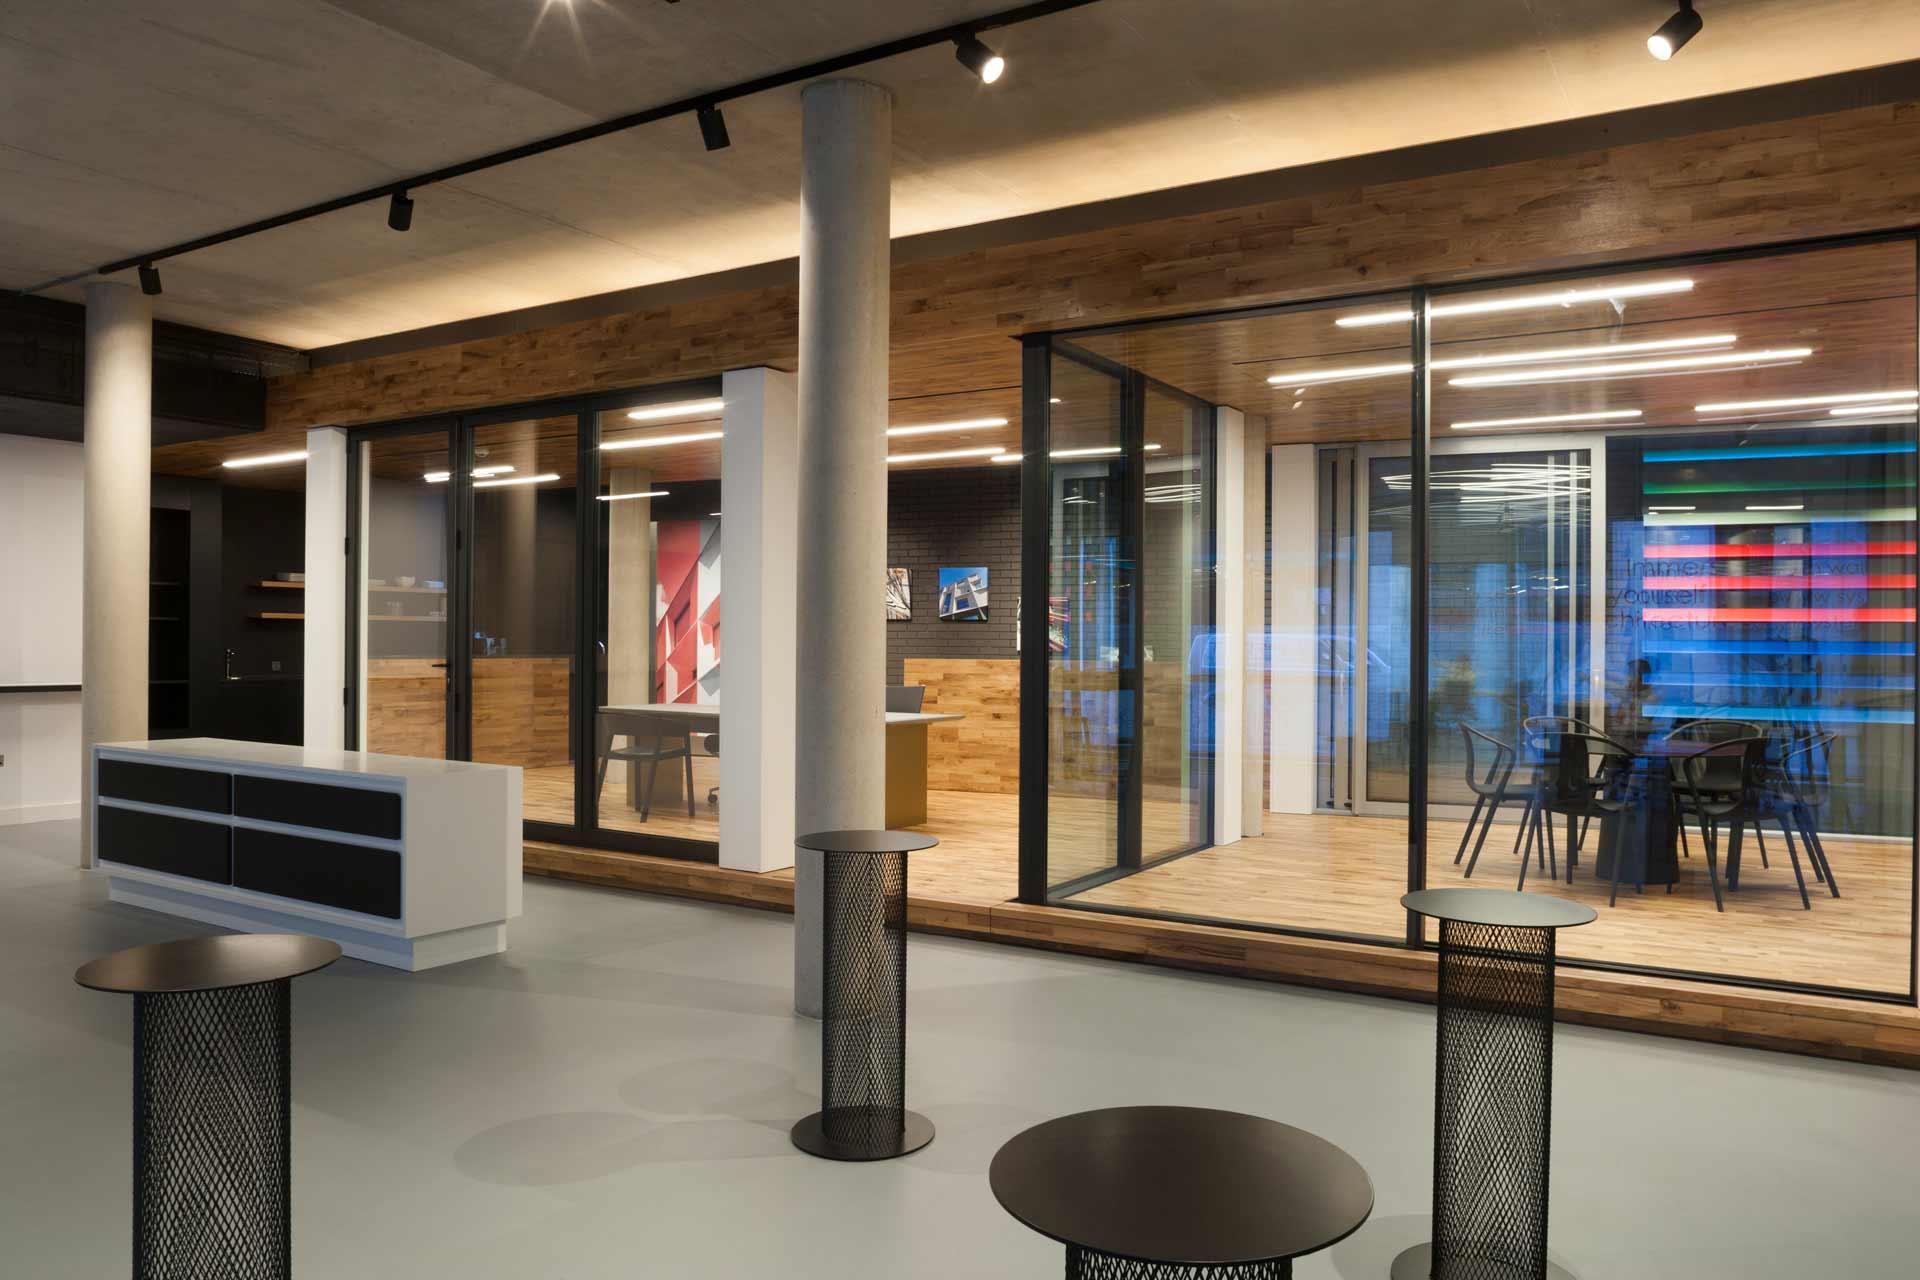 Aluk Design Studio